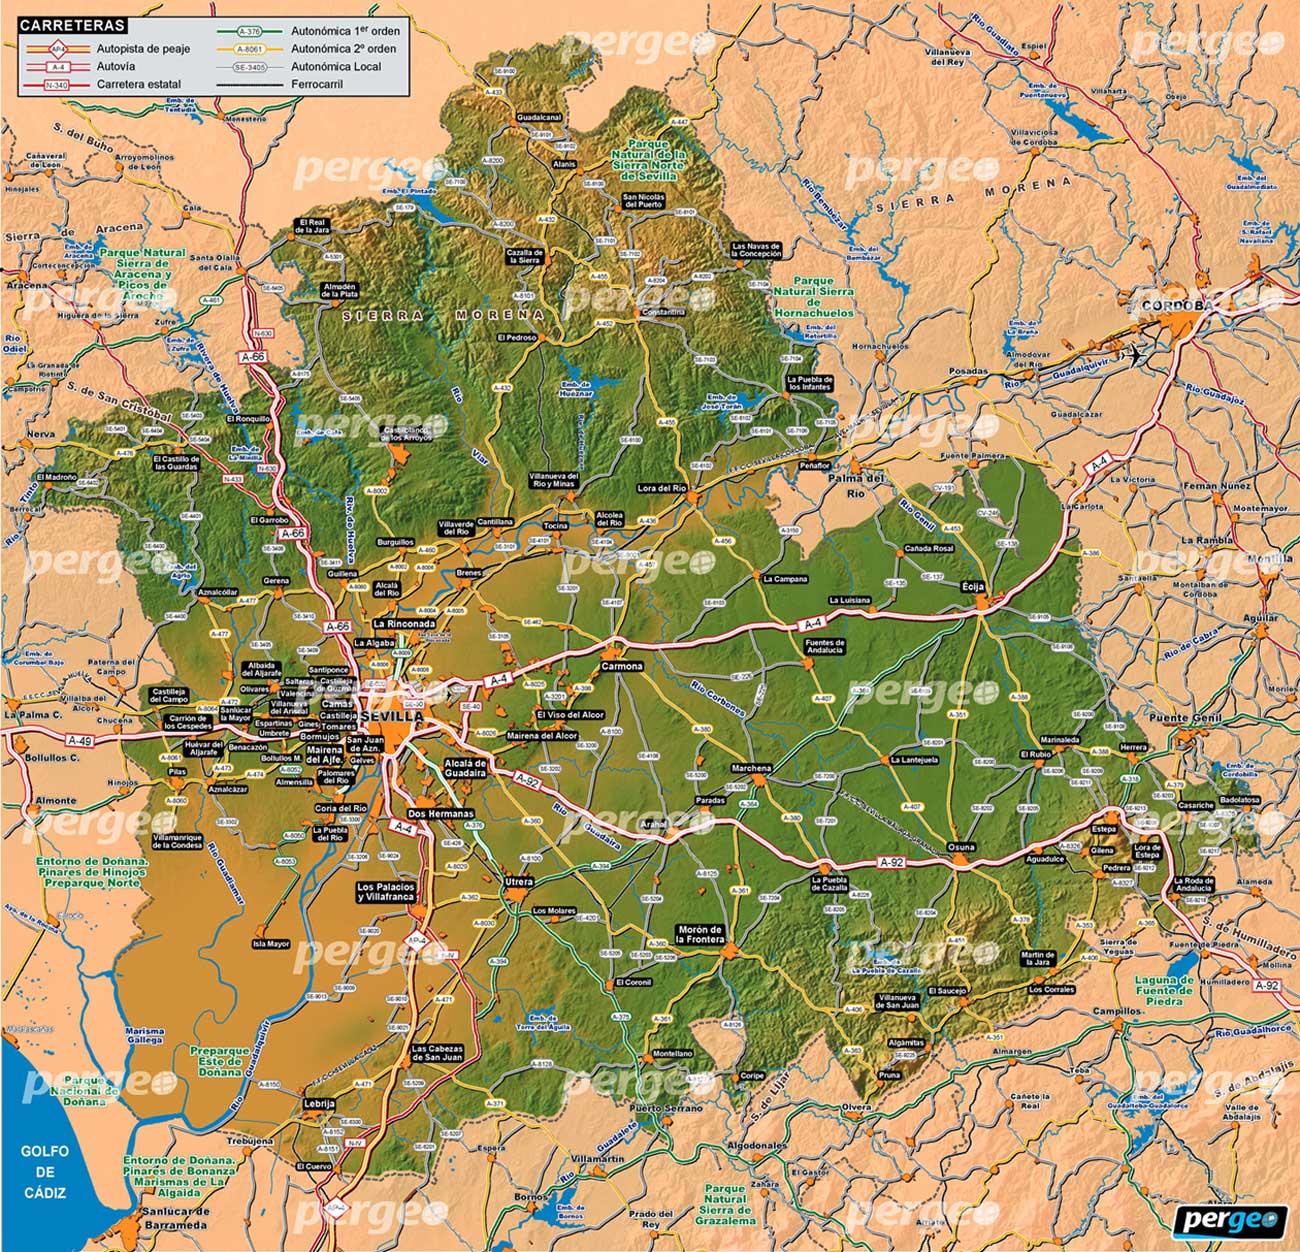 Provincia De Sevilla Mapa.Provincia De Sevilla Mapa Artistico E Ilustradopergeo Es